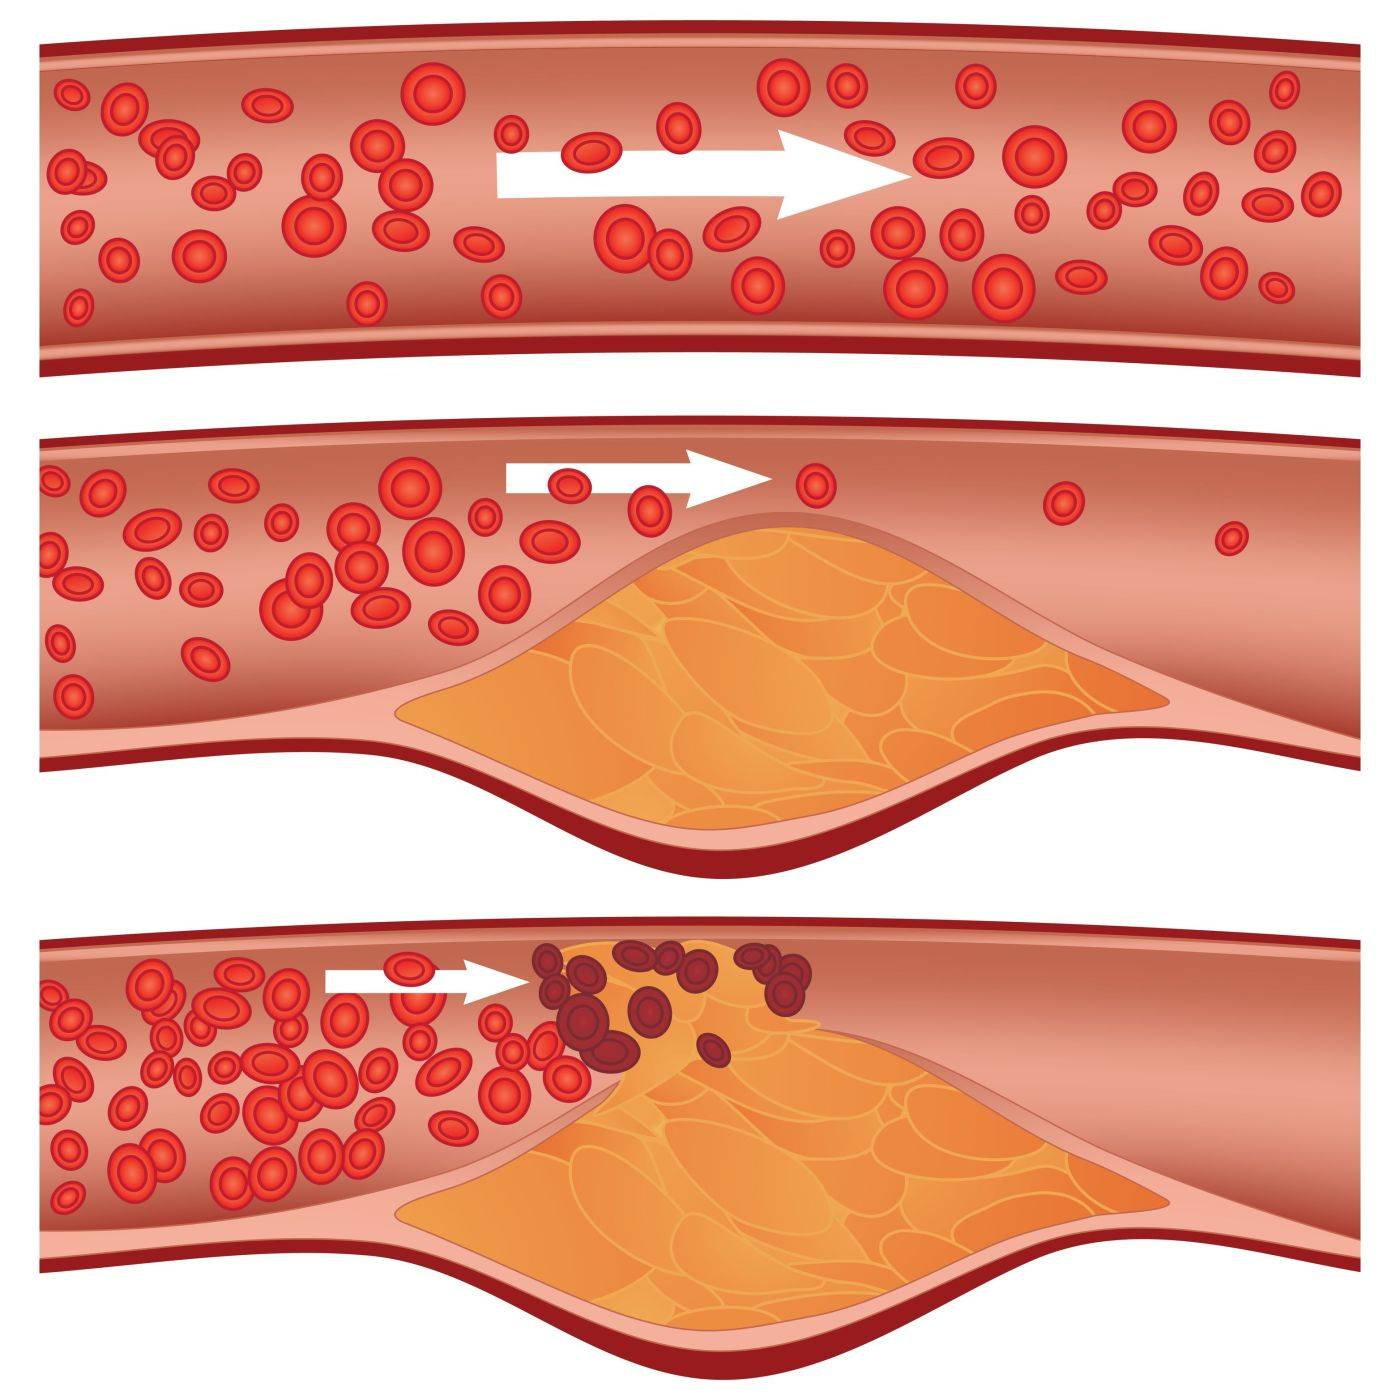 5 признаков забитых артерий